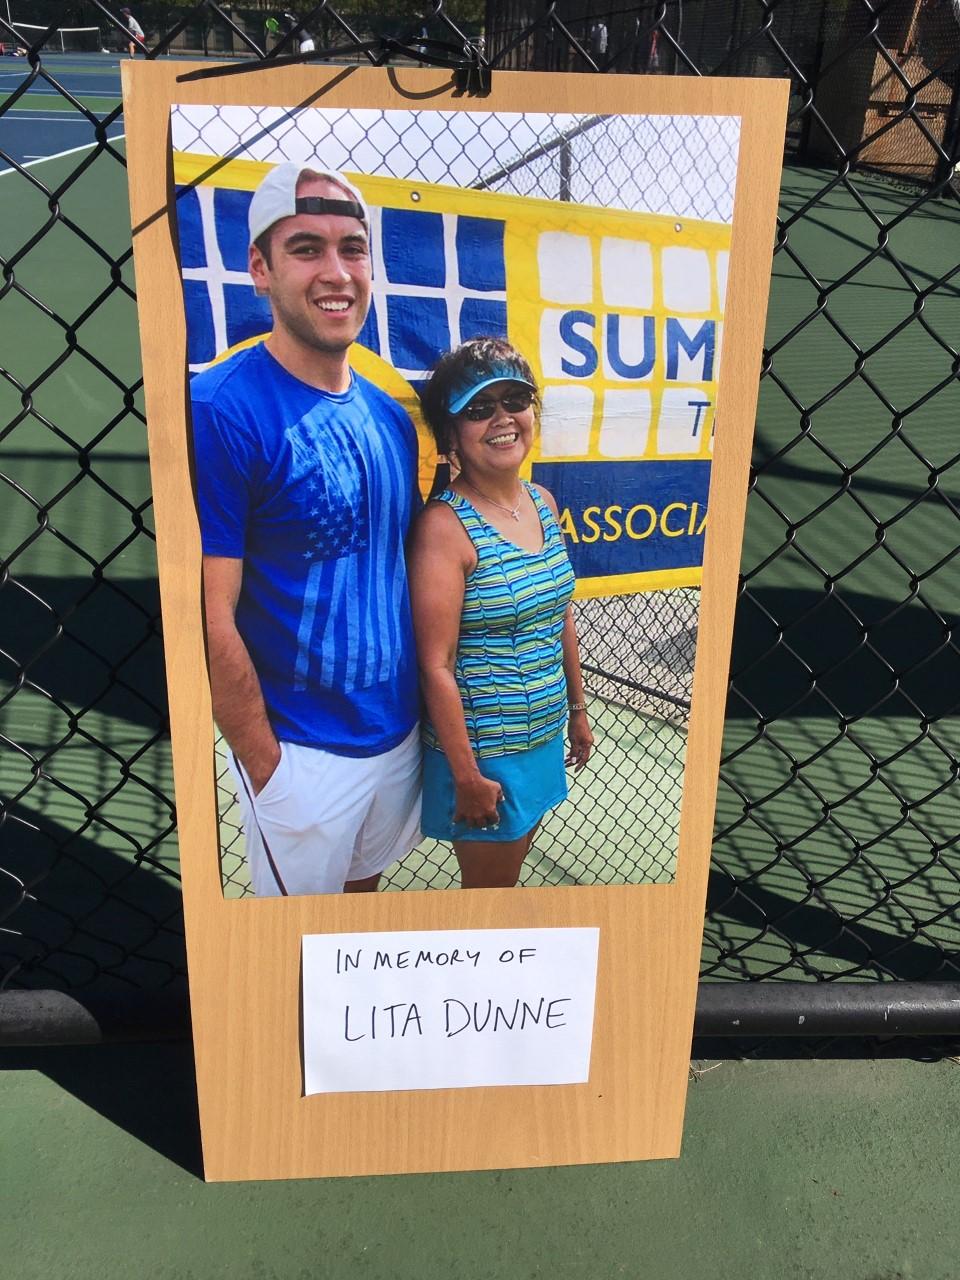 Lita Dunne Doubles Tournament